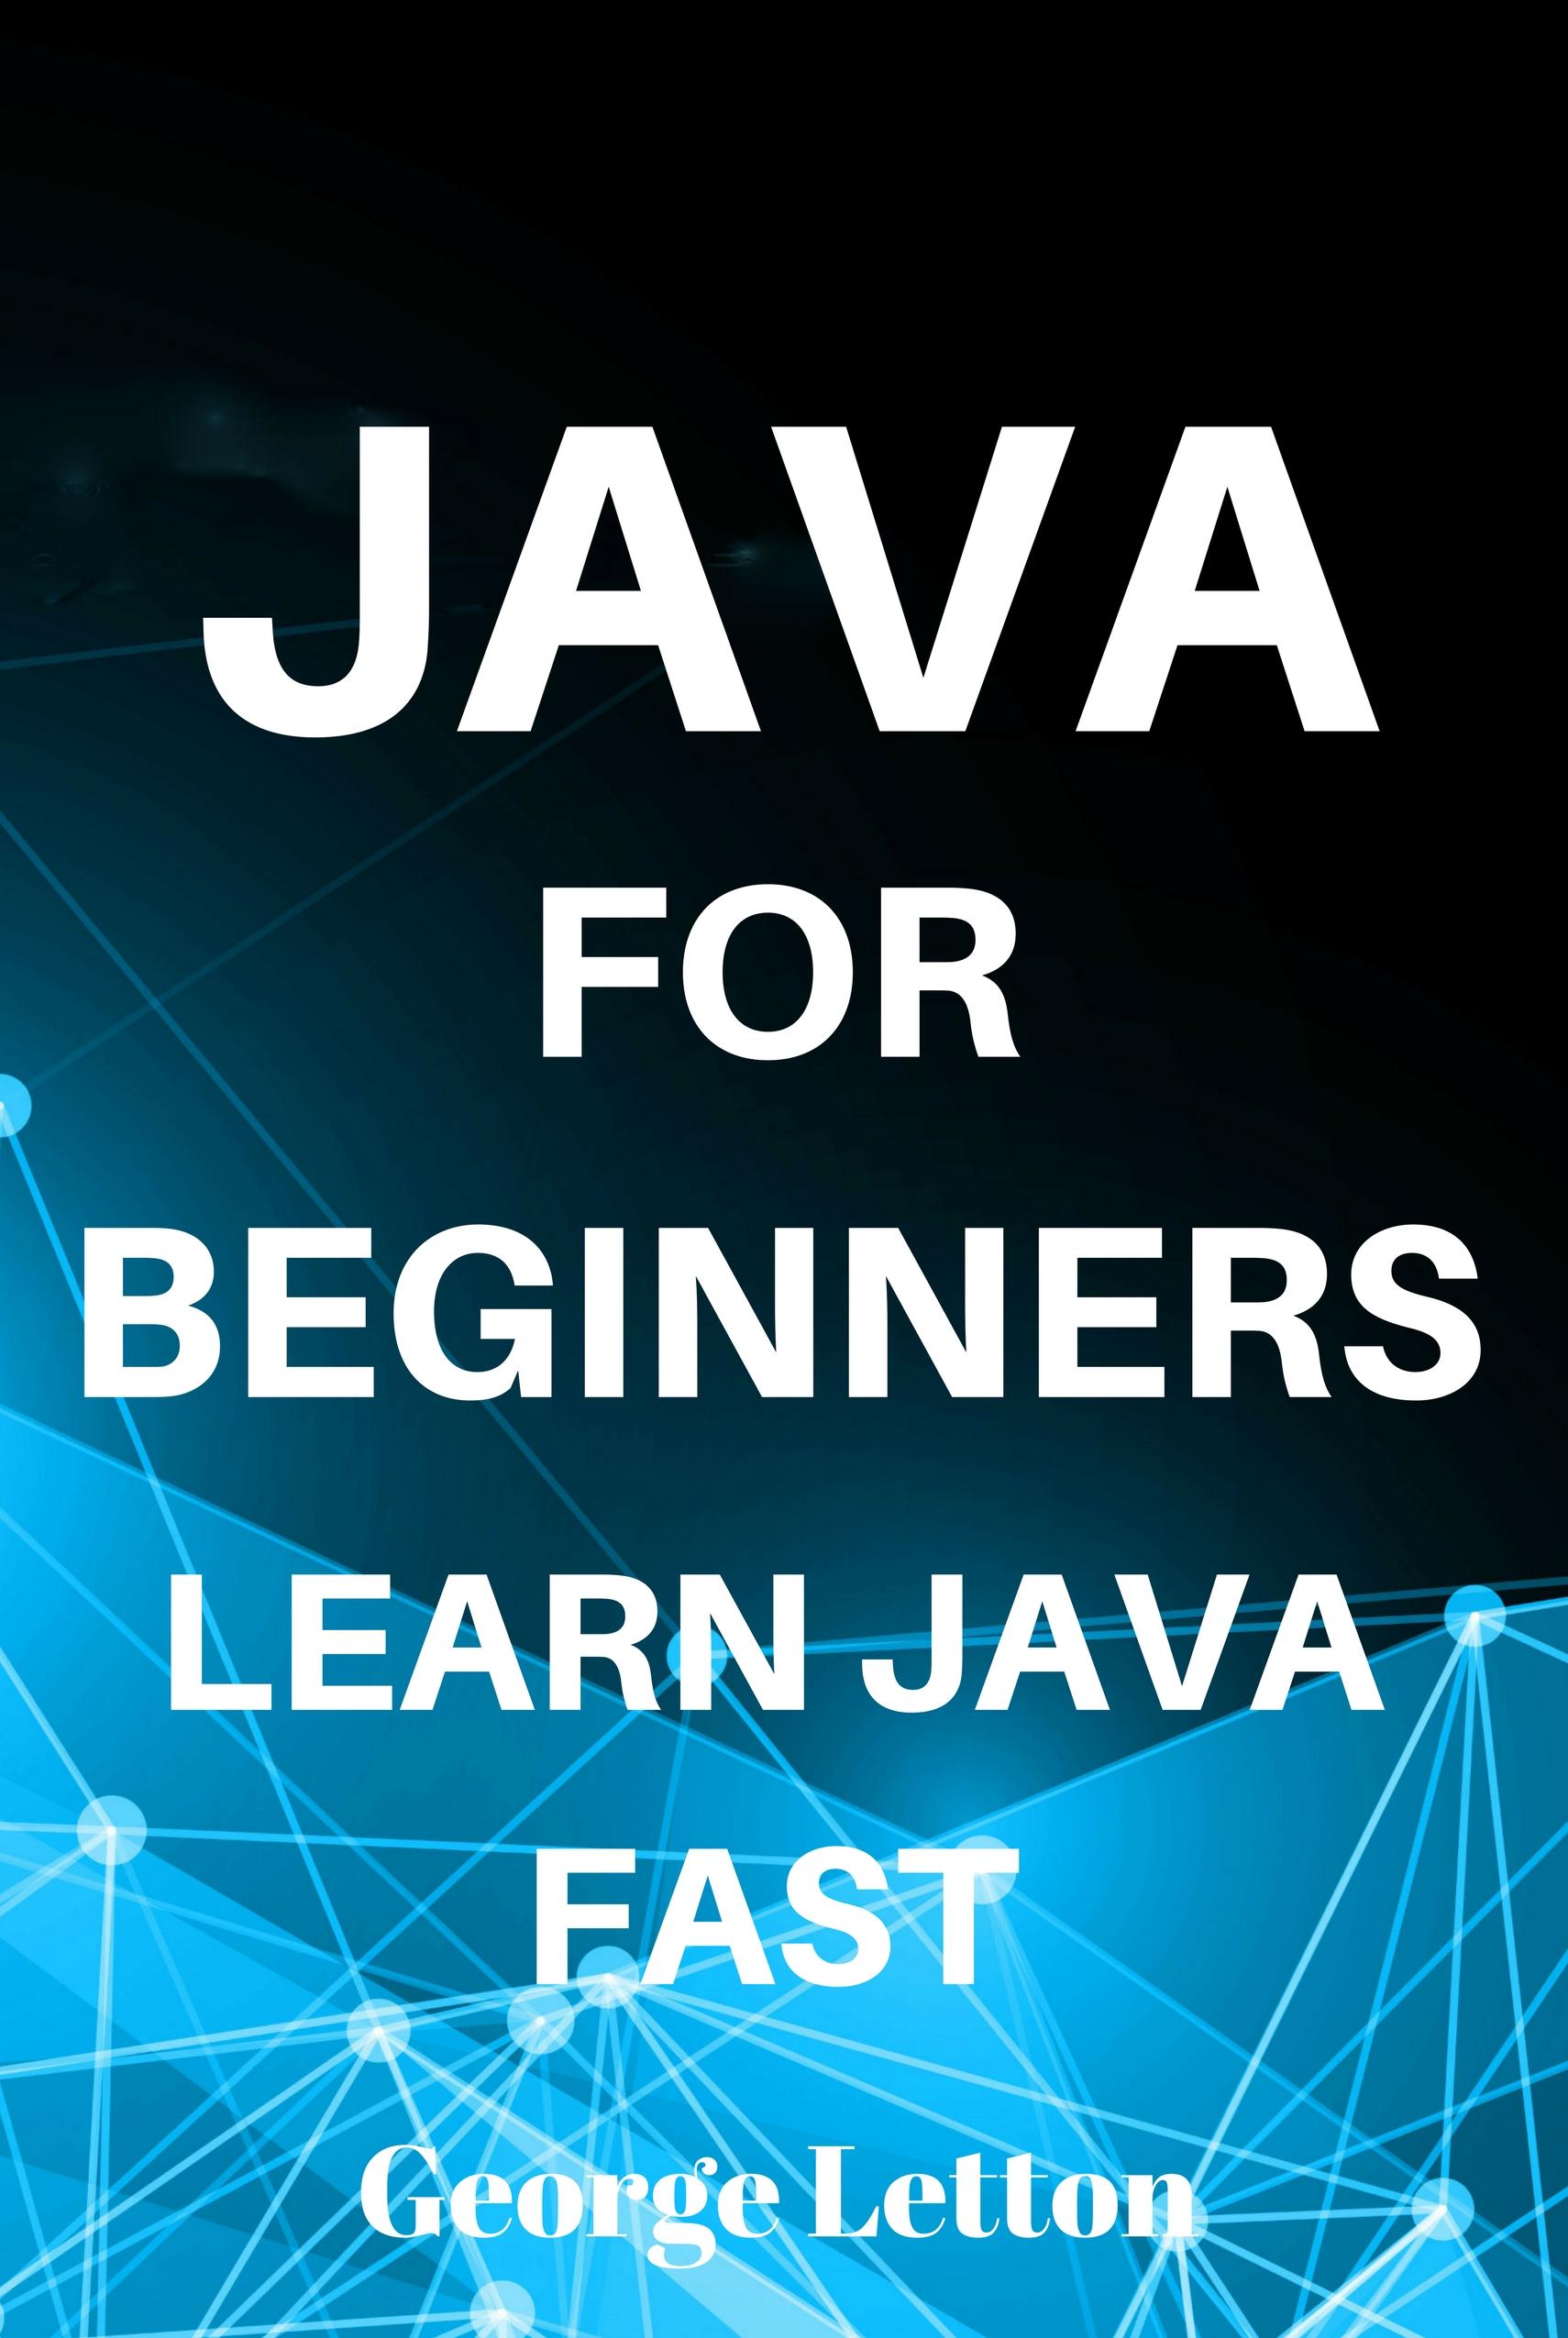 Smashwords java for beginners learn java fast a book by java for beginners learn java fast baditri Gallery